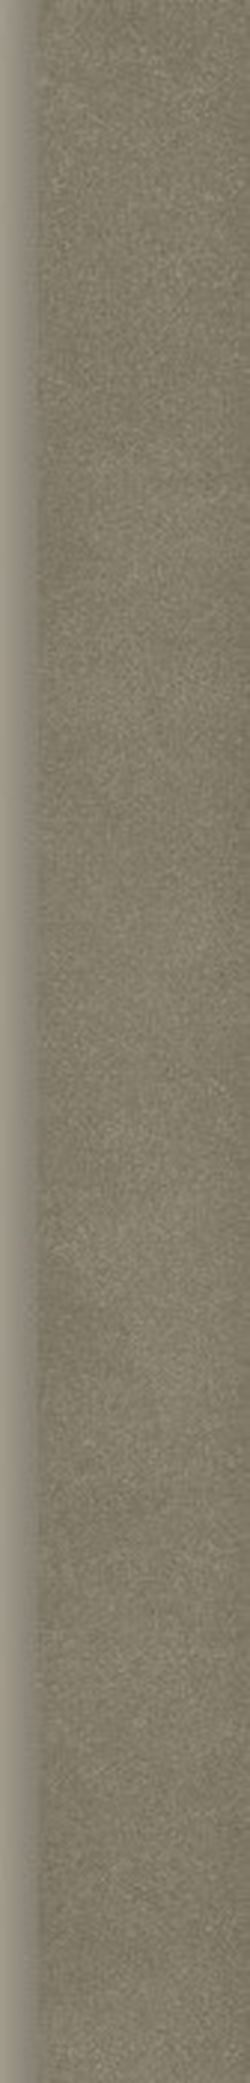 Paradyż Naturstone Umbra Cokół Mat. (Profil Mat)